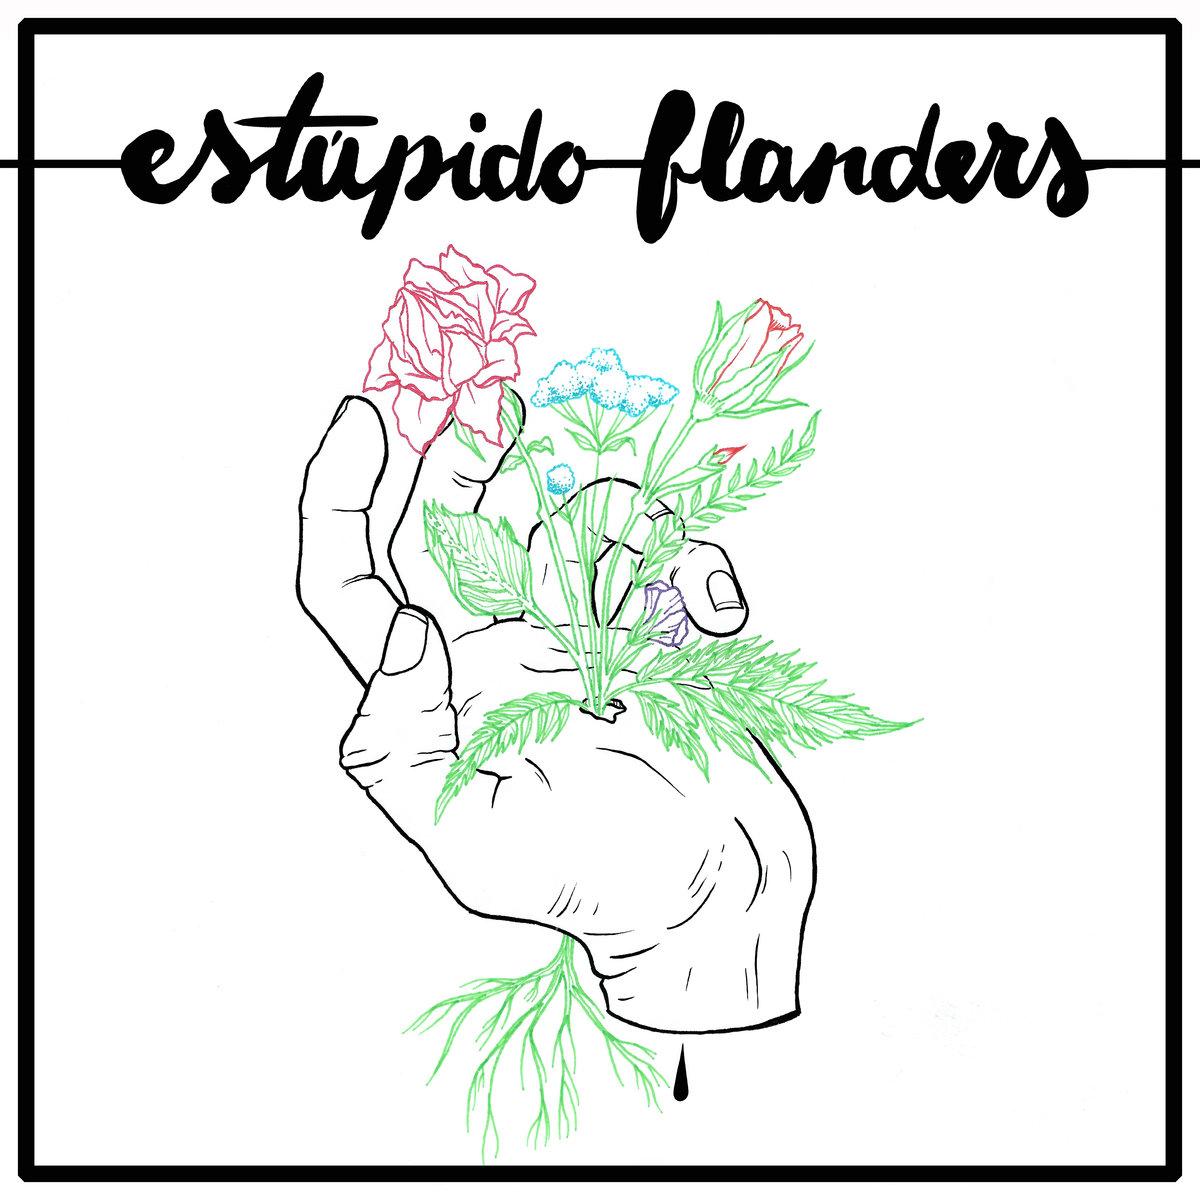 Upcoming: Estupido Flanders - Good Girl Good Boy